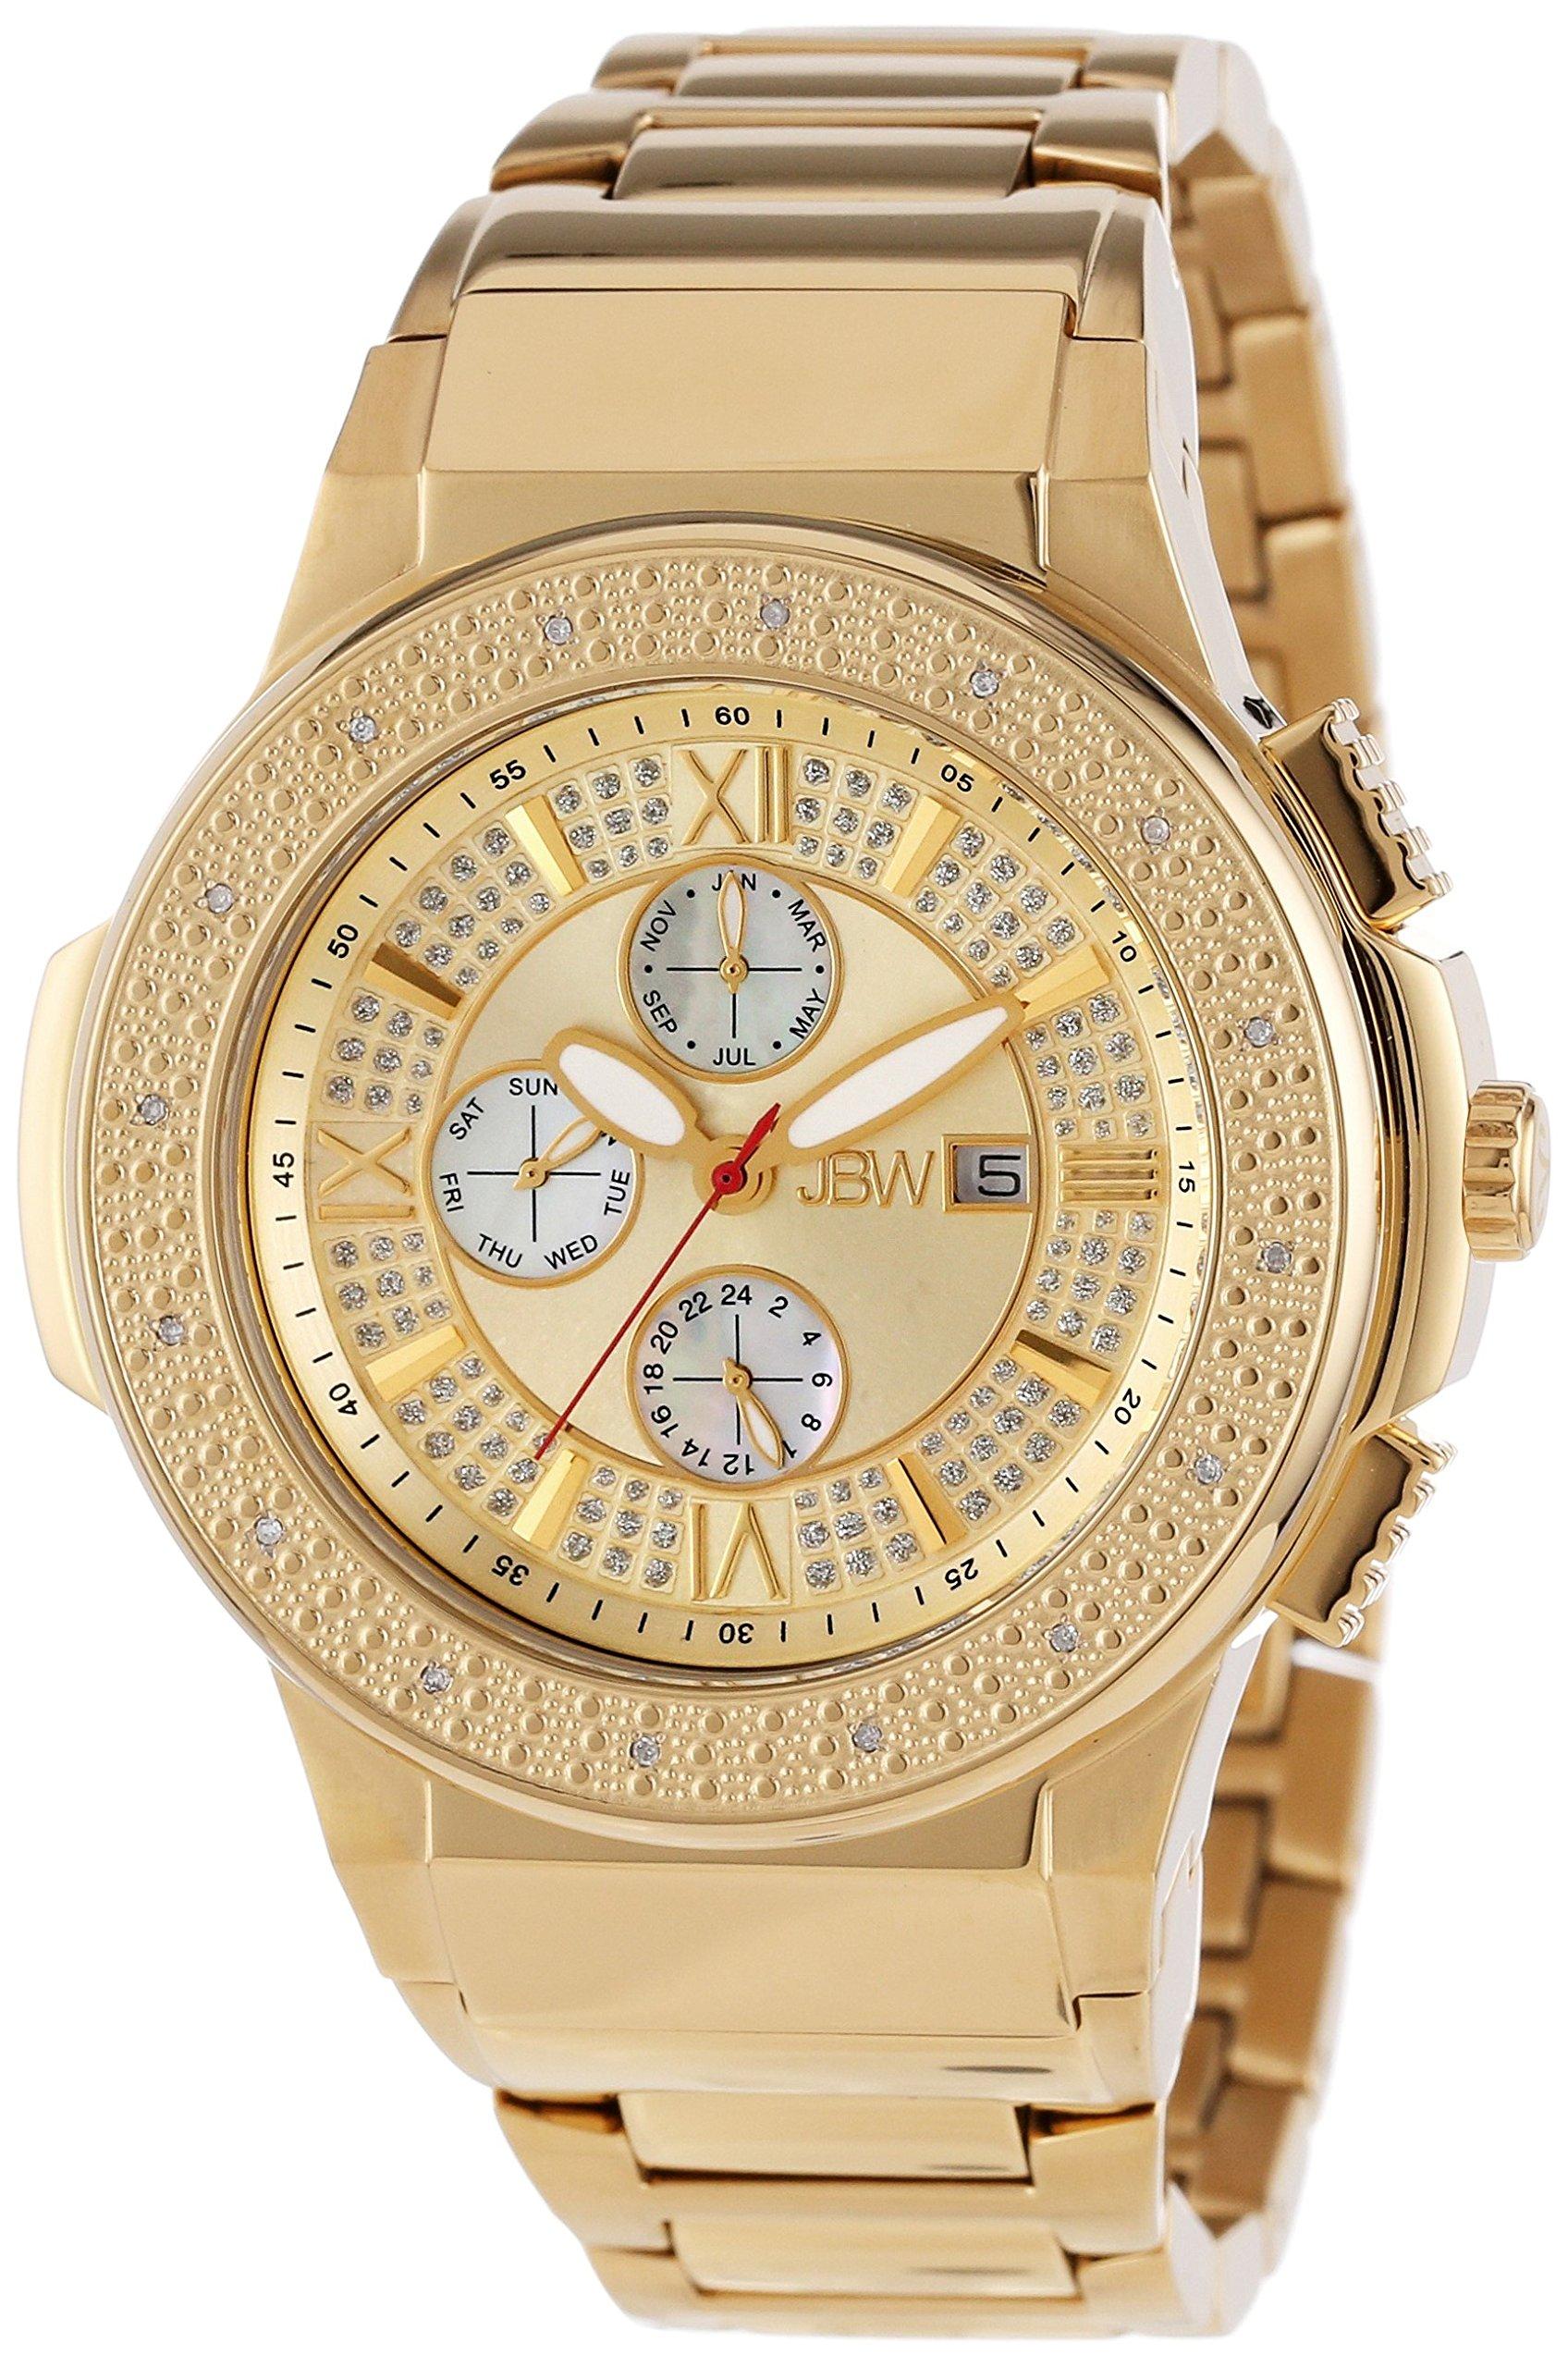 "Jbw Men's Jb-6101-D ""Saxon"" 18K Gold-Plated Diamond-Accented Watch 10"